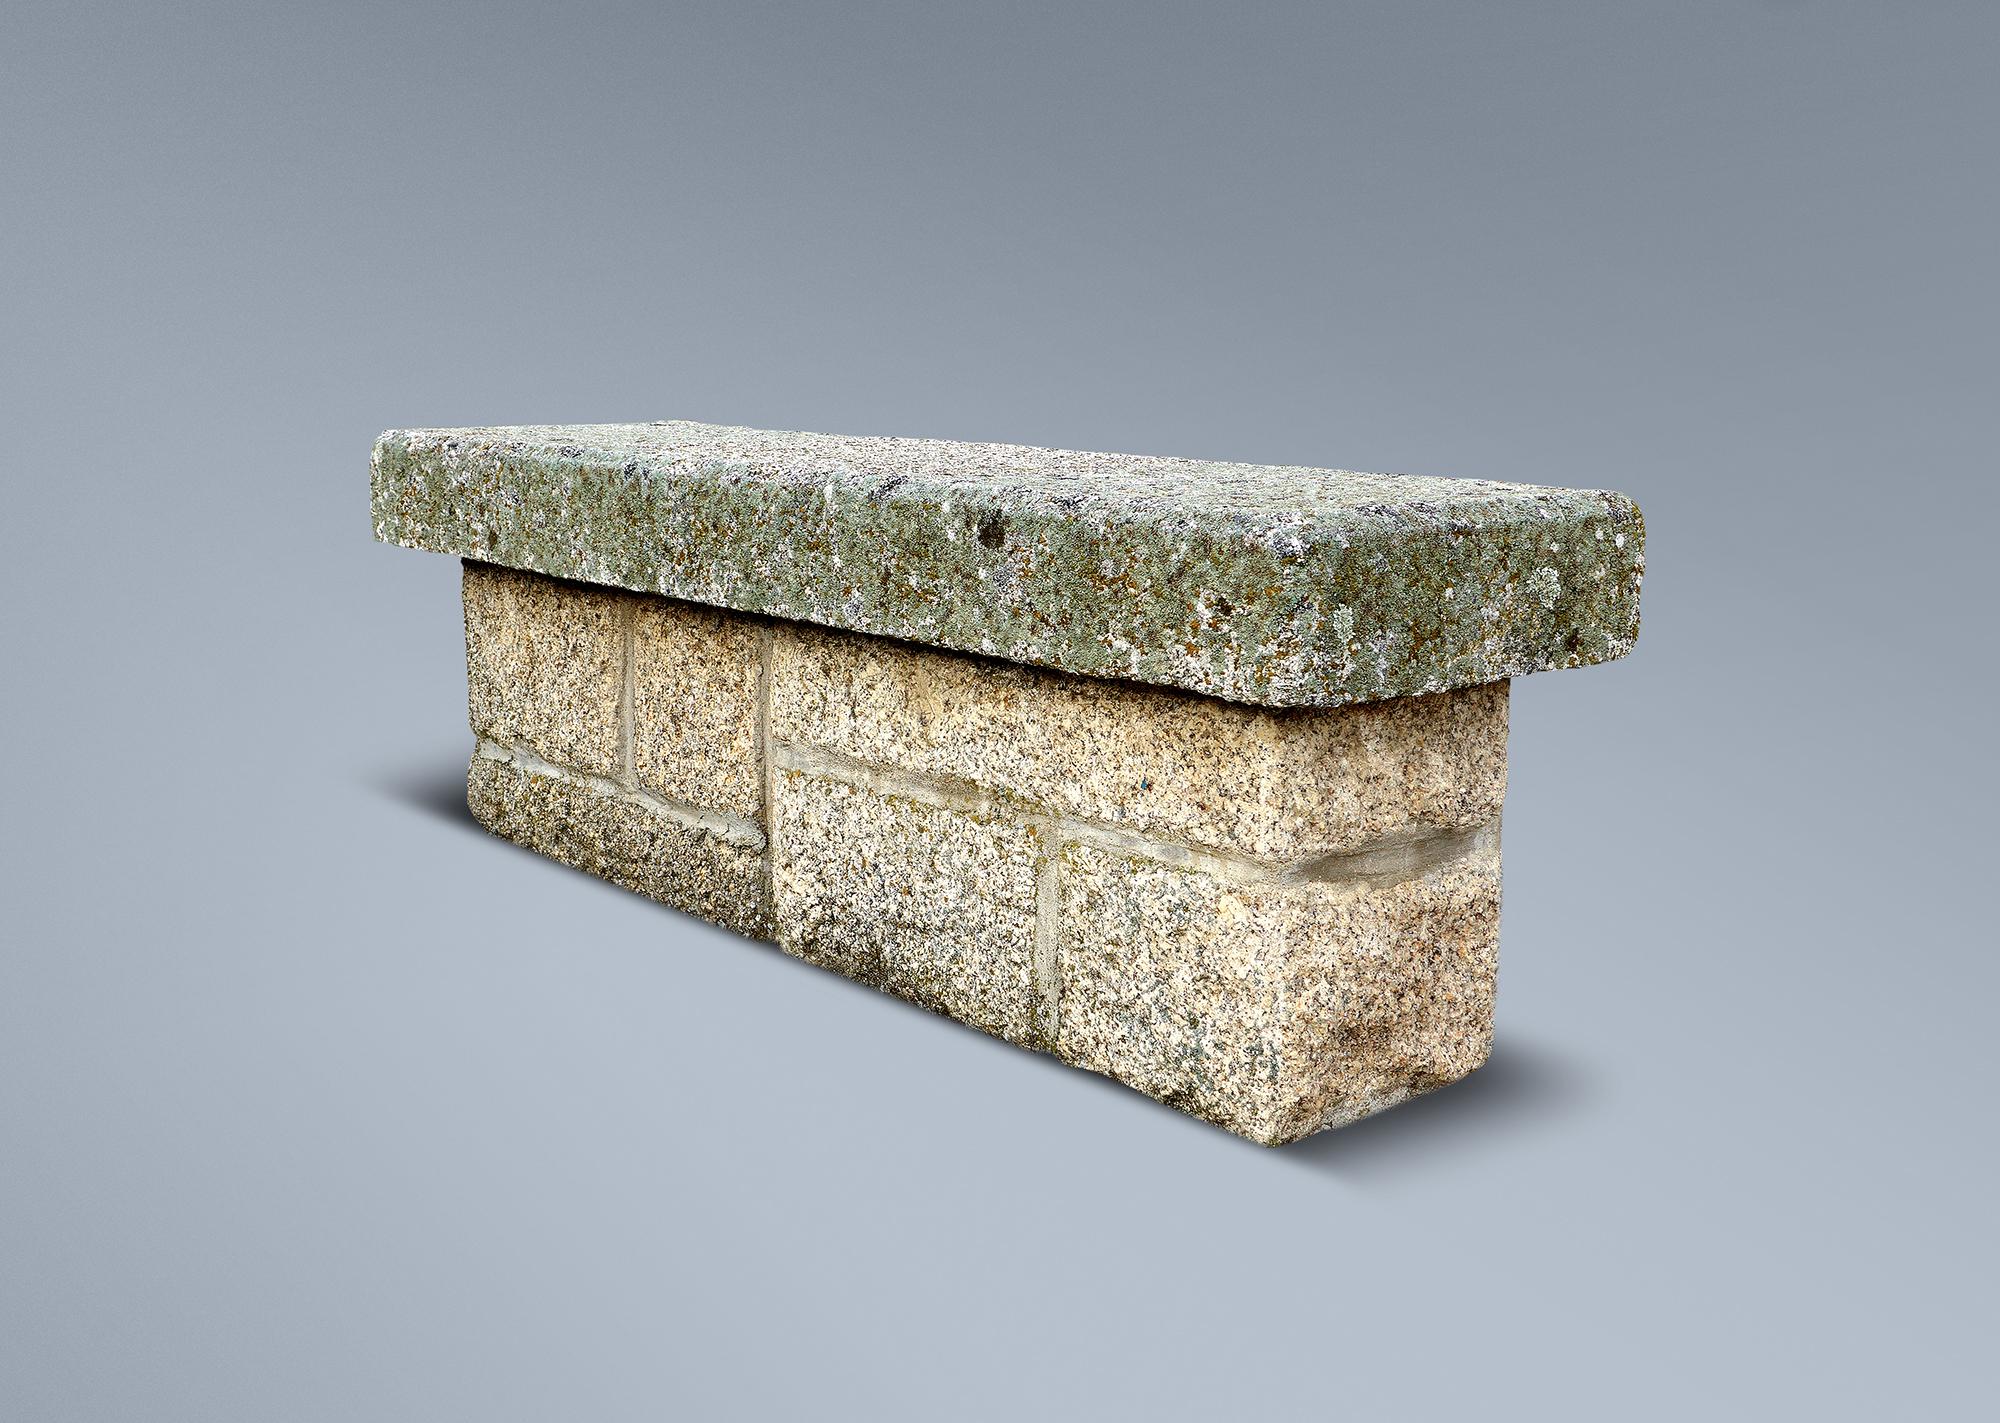 Banco r stico de granito for Bancos de granito para jardin